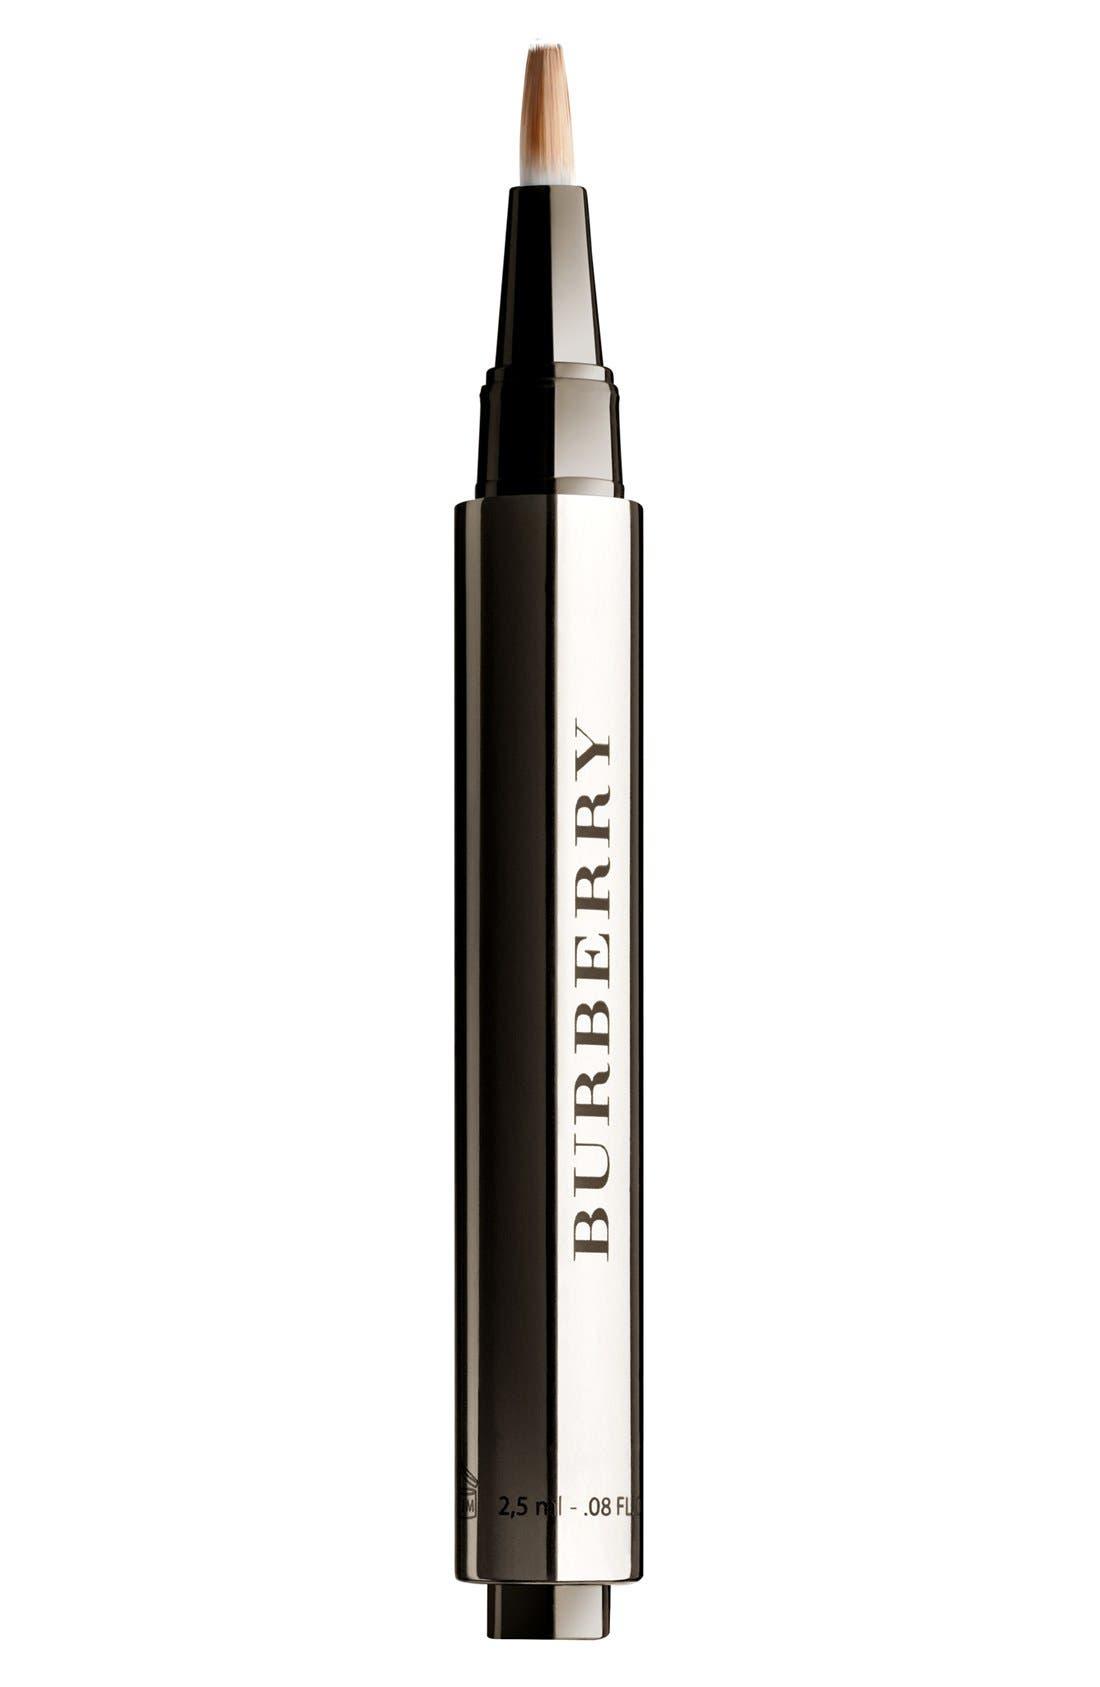 Burberry Beauty 'Sheer Luminous' Concealer